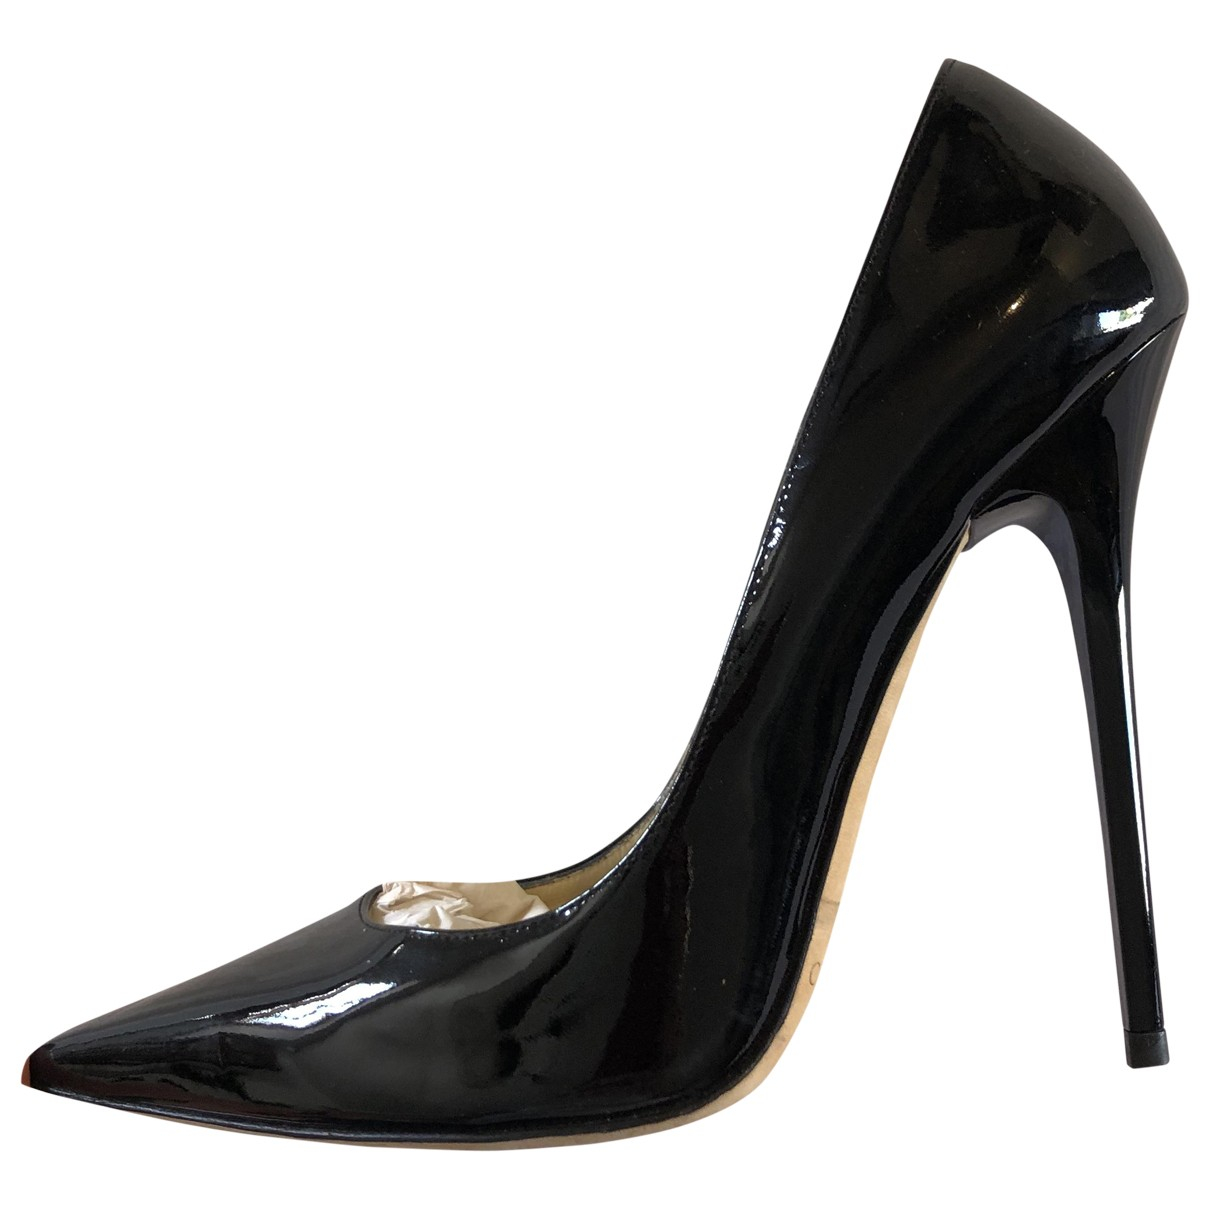 Jimmy Choo \N Black Patent leather Heels for Women 37.5 EU